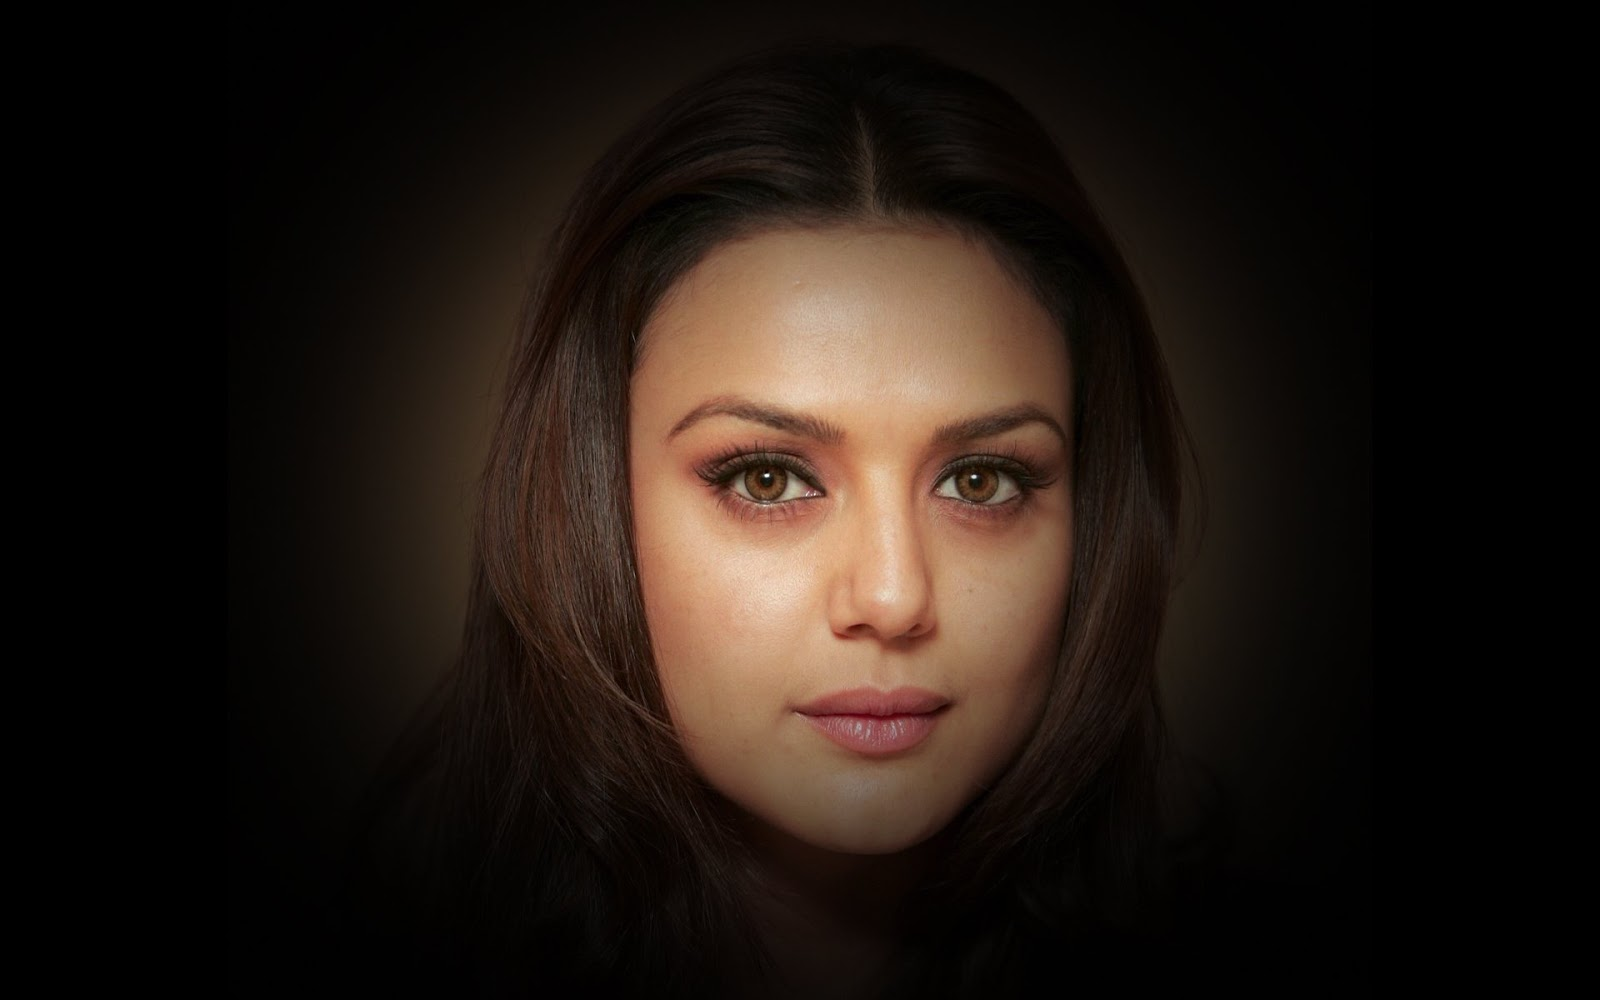 Preity Zinta Ki Sexy Photo Download